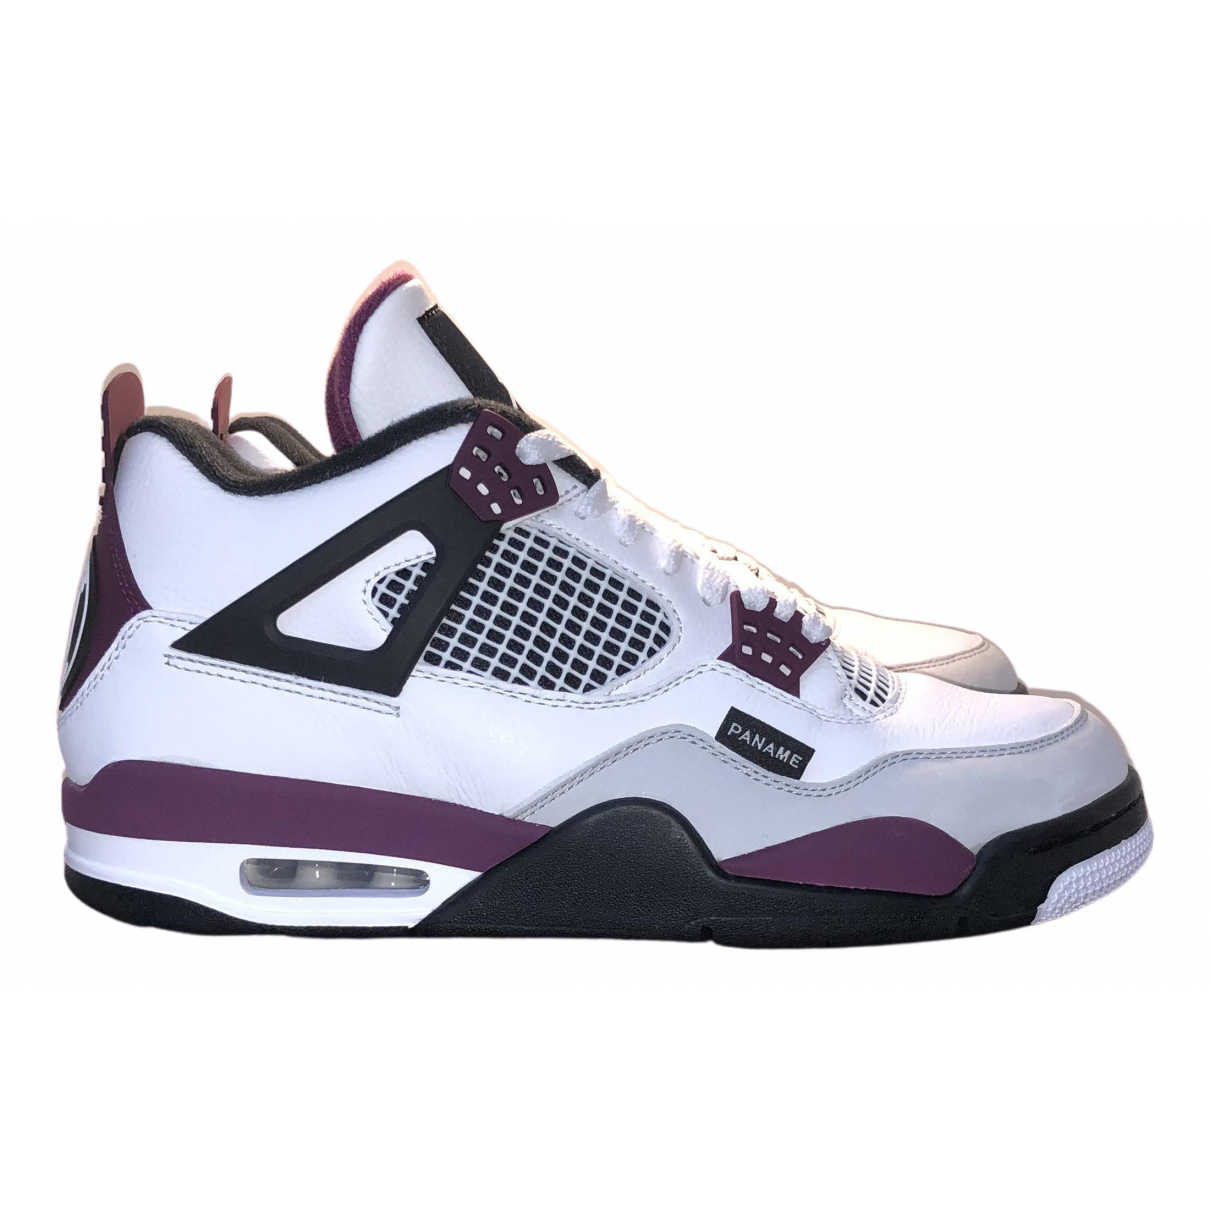 Jordan - Baskets Air Jordan 4 pour homme en cuir - blanc